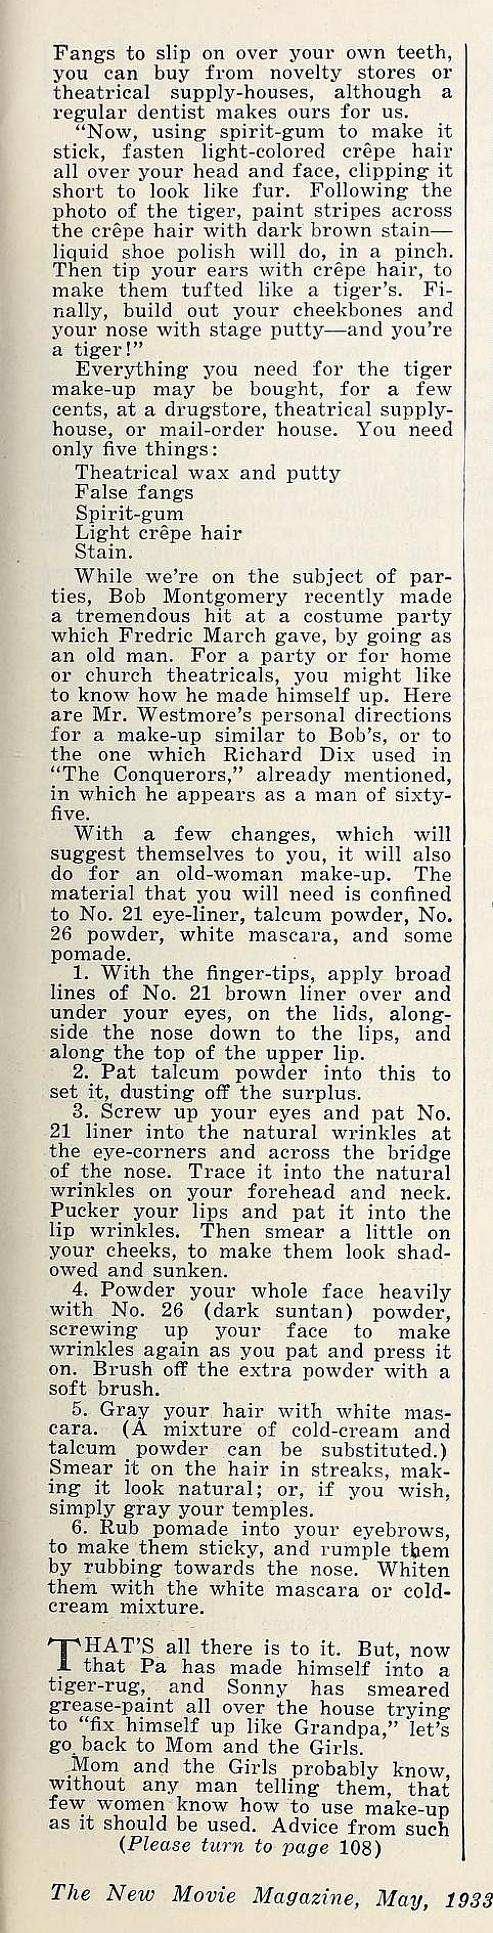 carole lombard the new movie magazine may 1933da